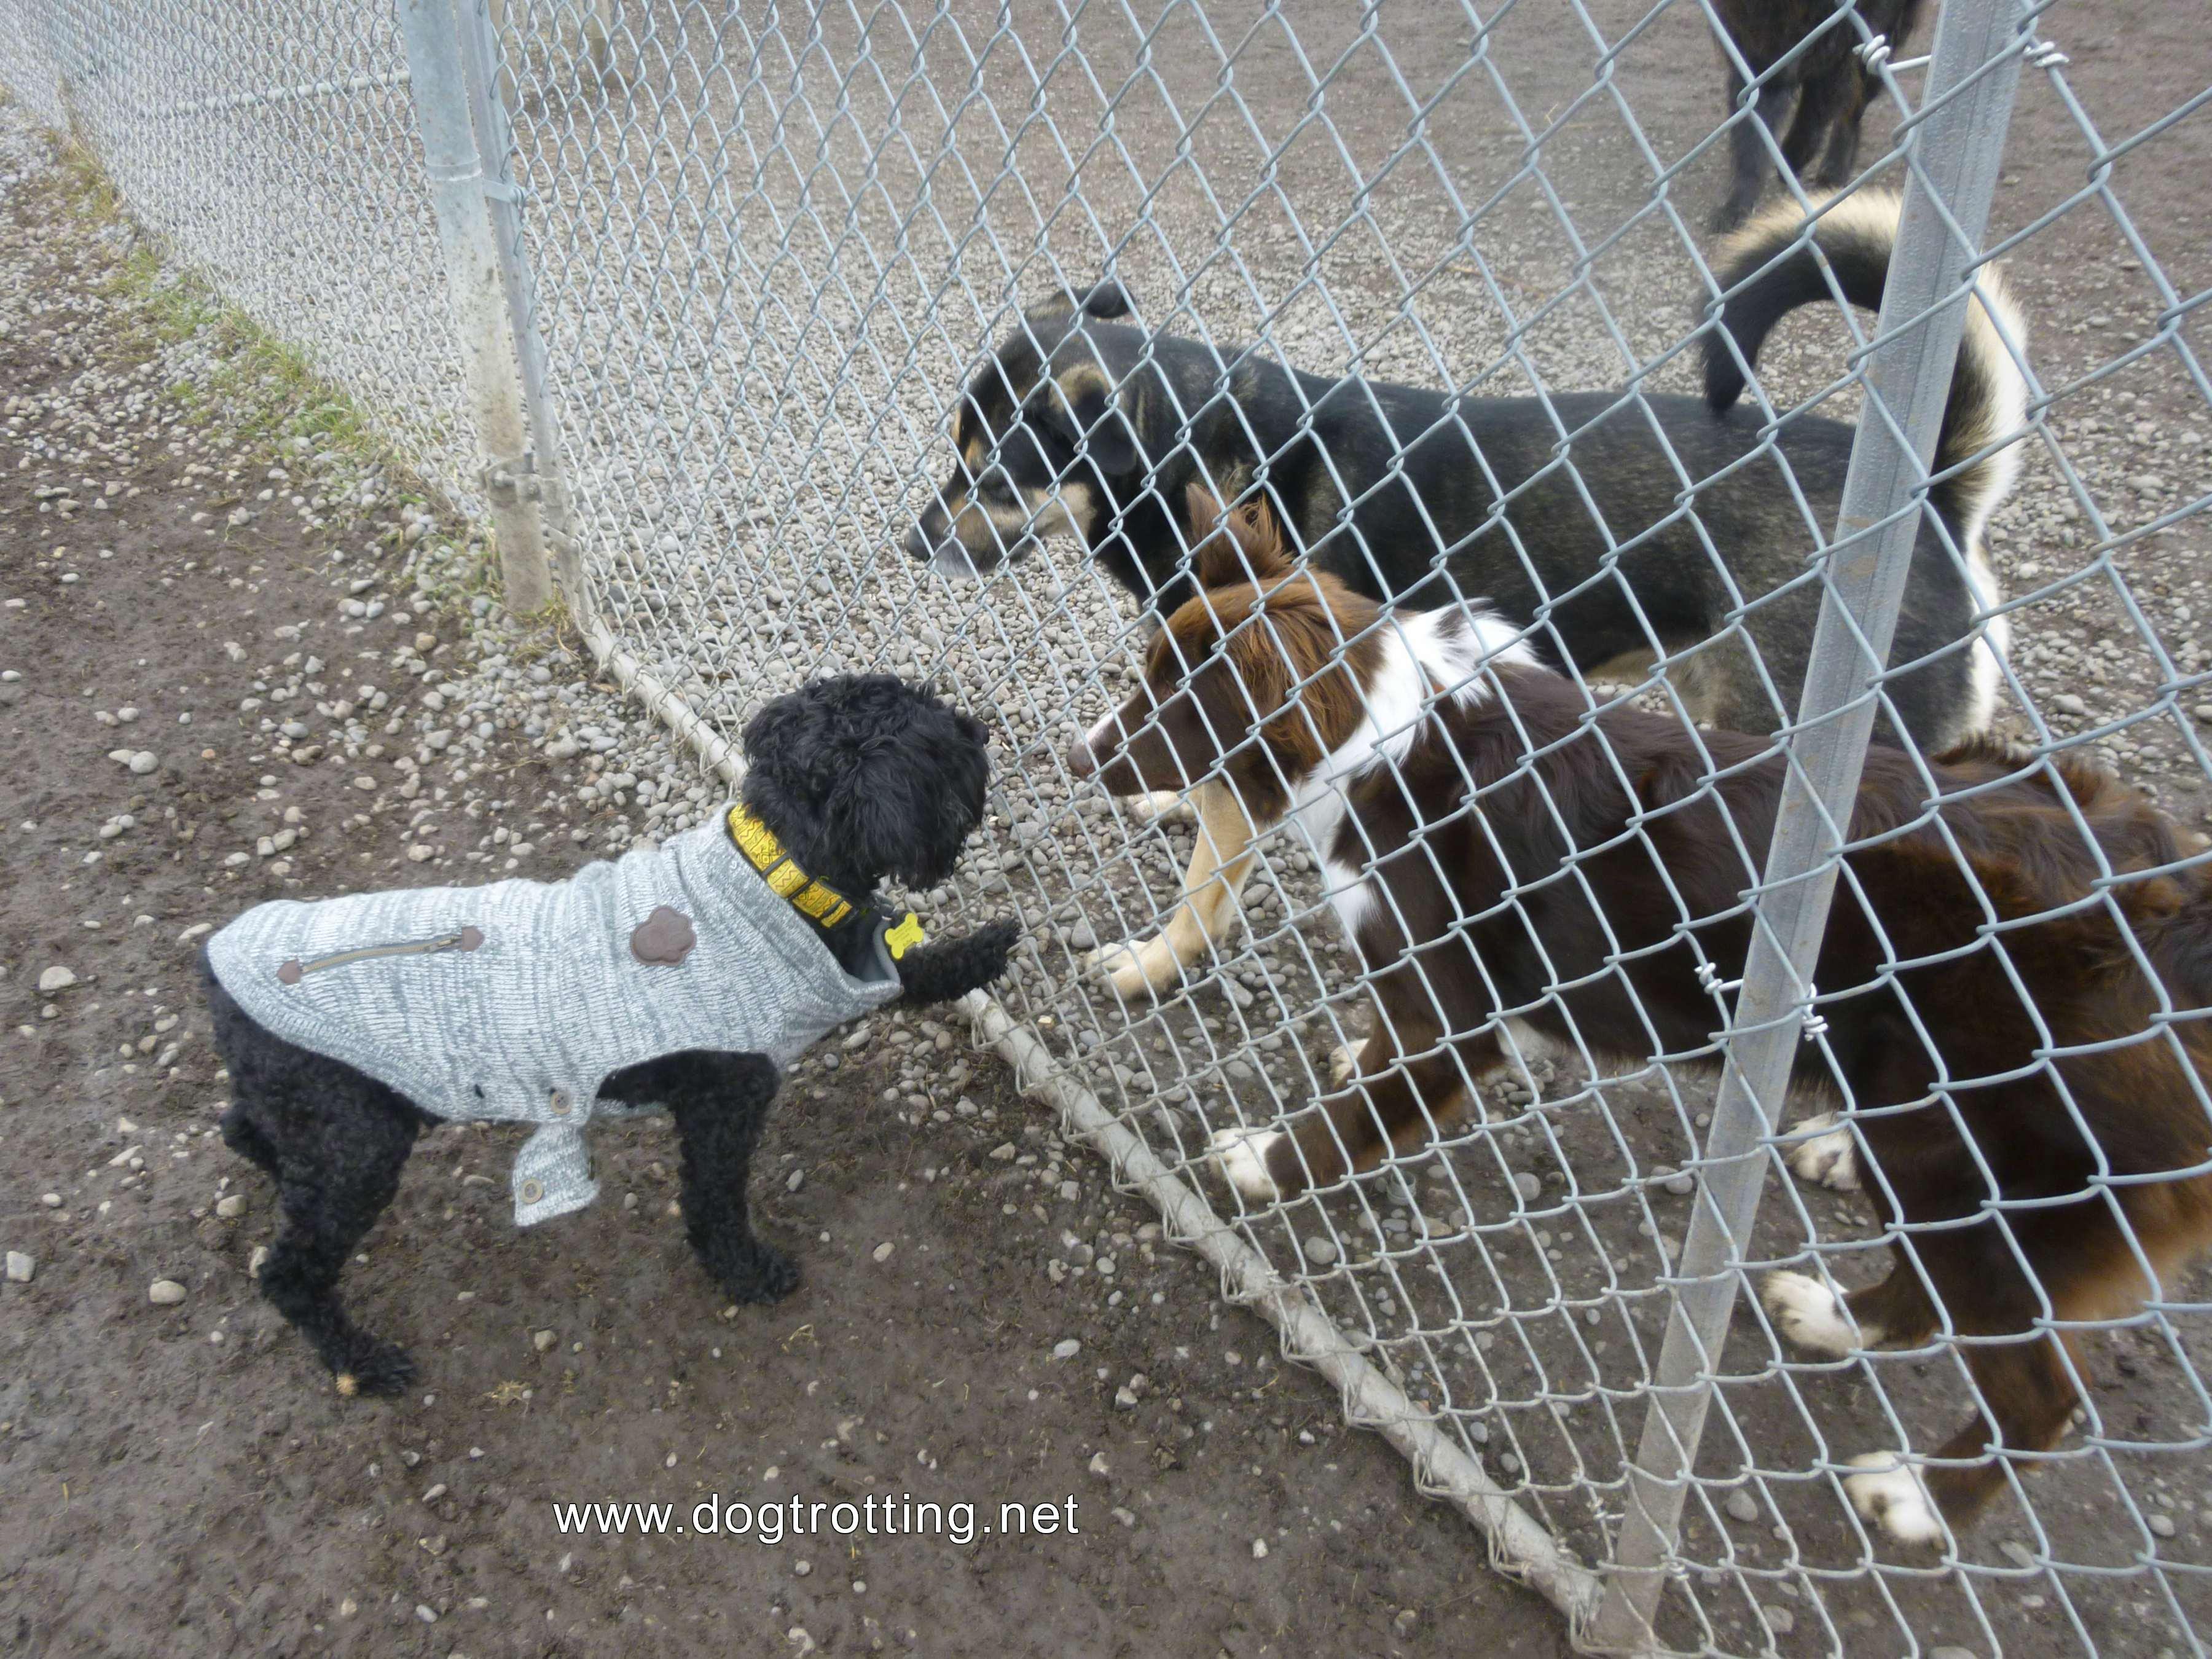 Three dogs at Peterborough leash-free dog park, Ontario